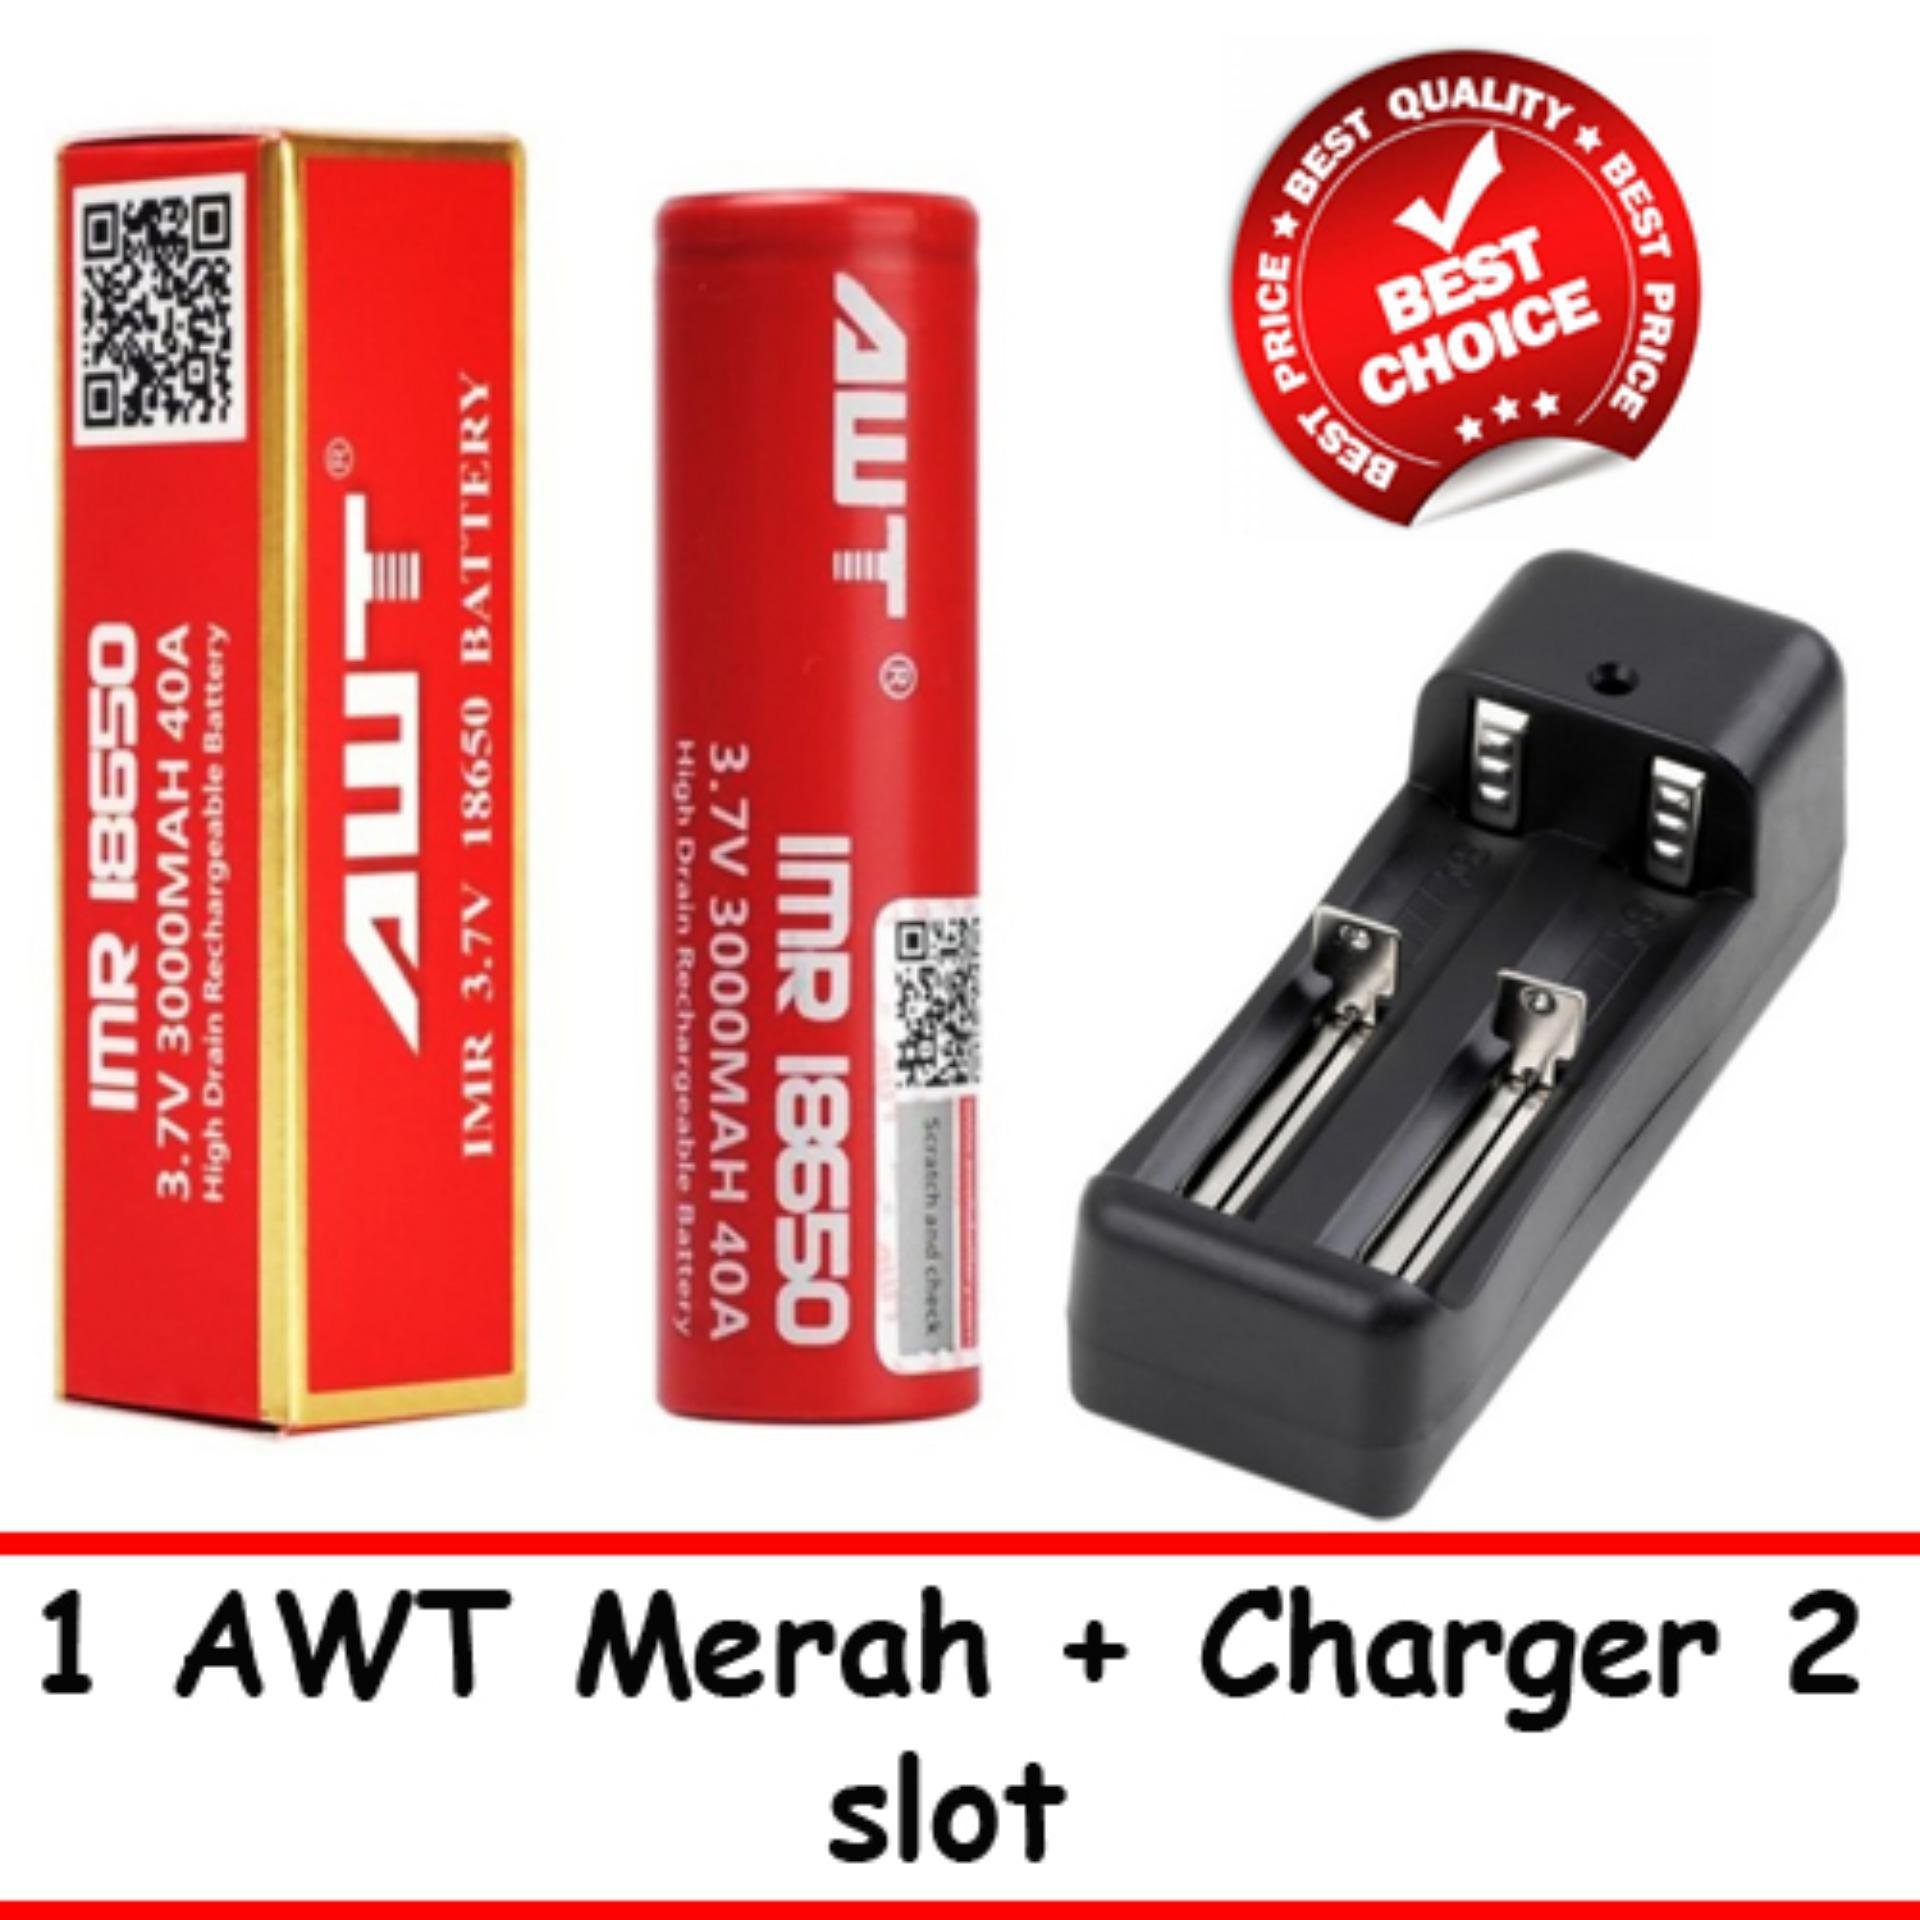 Baterai AWT 18650 3.7V Baterai Vape Vapor Rokok Elektrik Rechargeable Li-ion + Charger 2 Slot | Lazada Indonesia